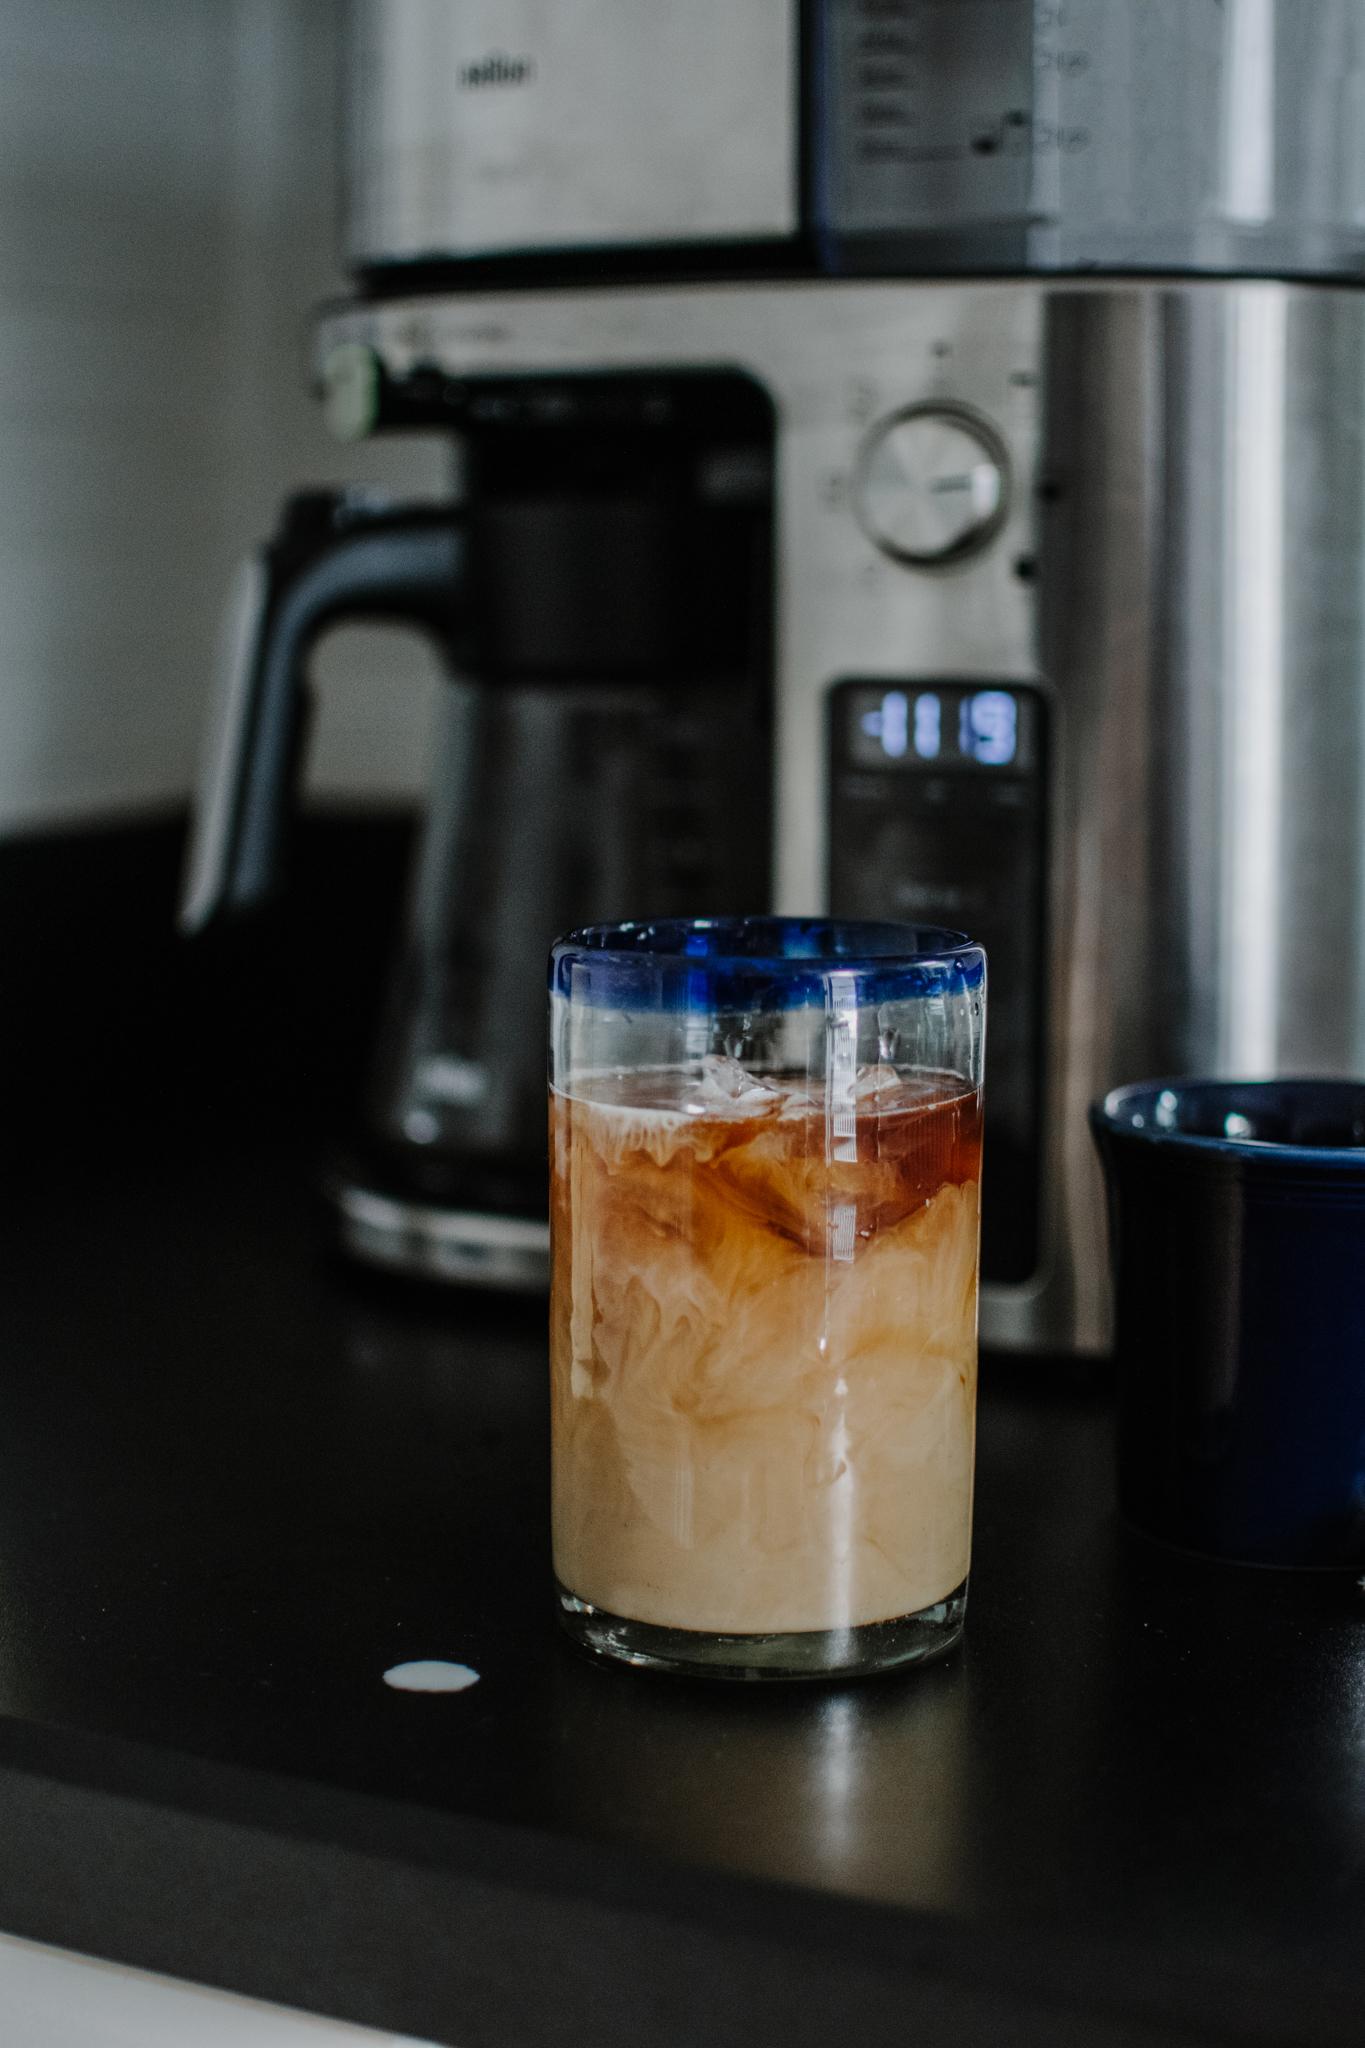 braun multiserve coffee maker review - best automatic coffee maker - automatic iced coffee maker